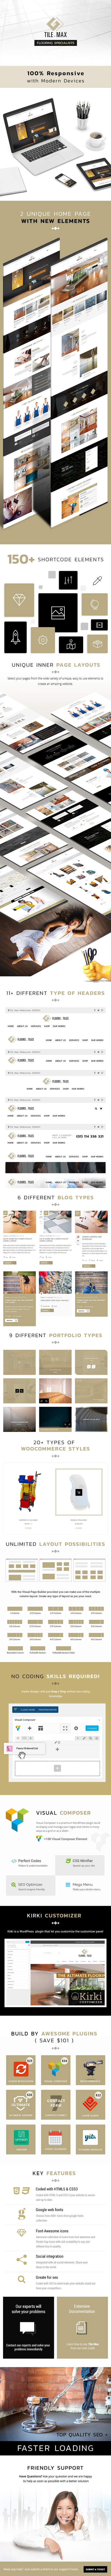 TileMax - Tiling, Flooring WordPress Theme - 1